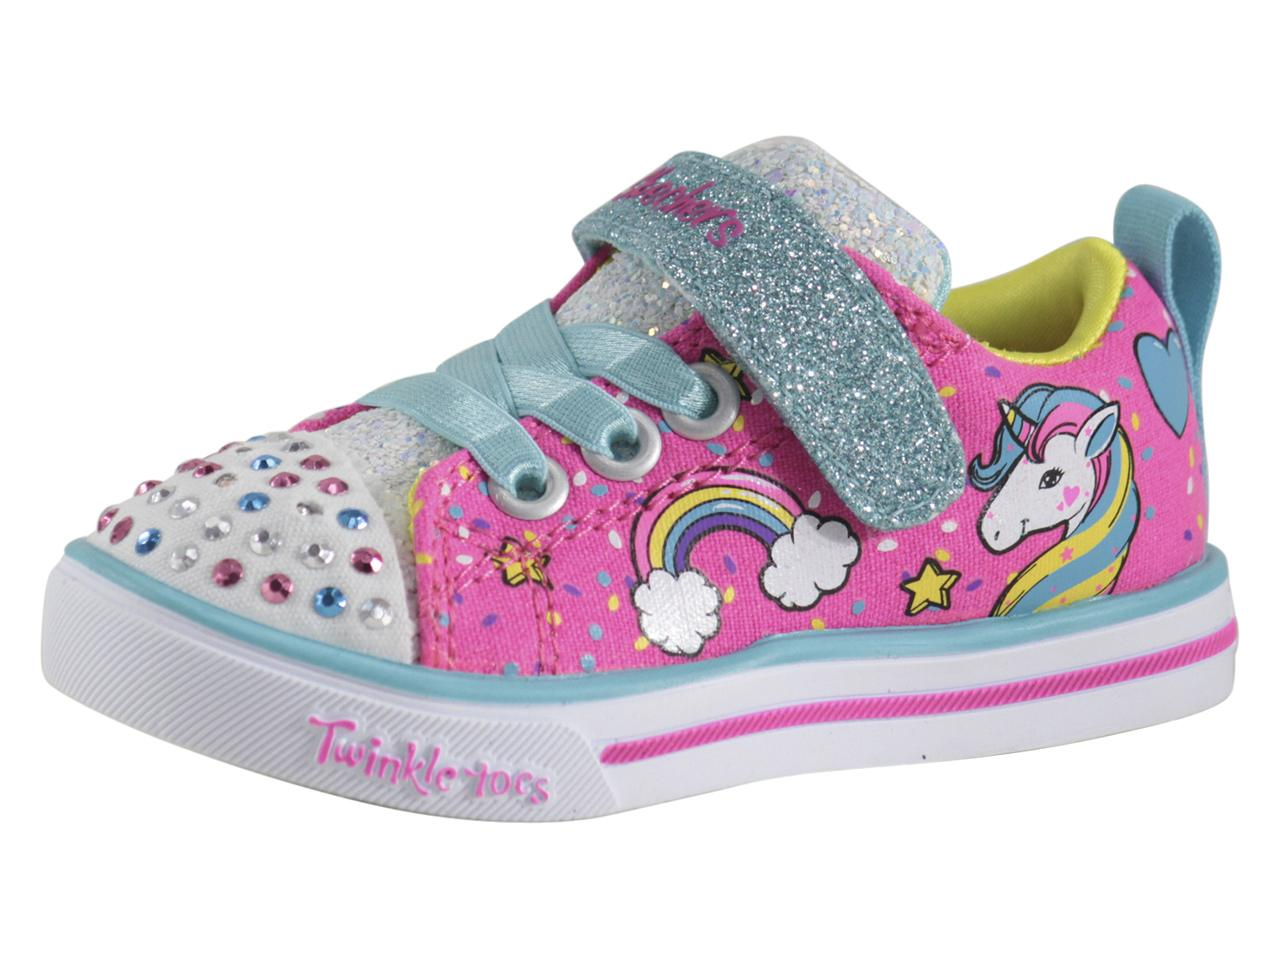 Skechers ToddlerLittle Girl's S Lights Unicorn Craze Light Up Sneakers Shoes